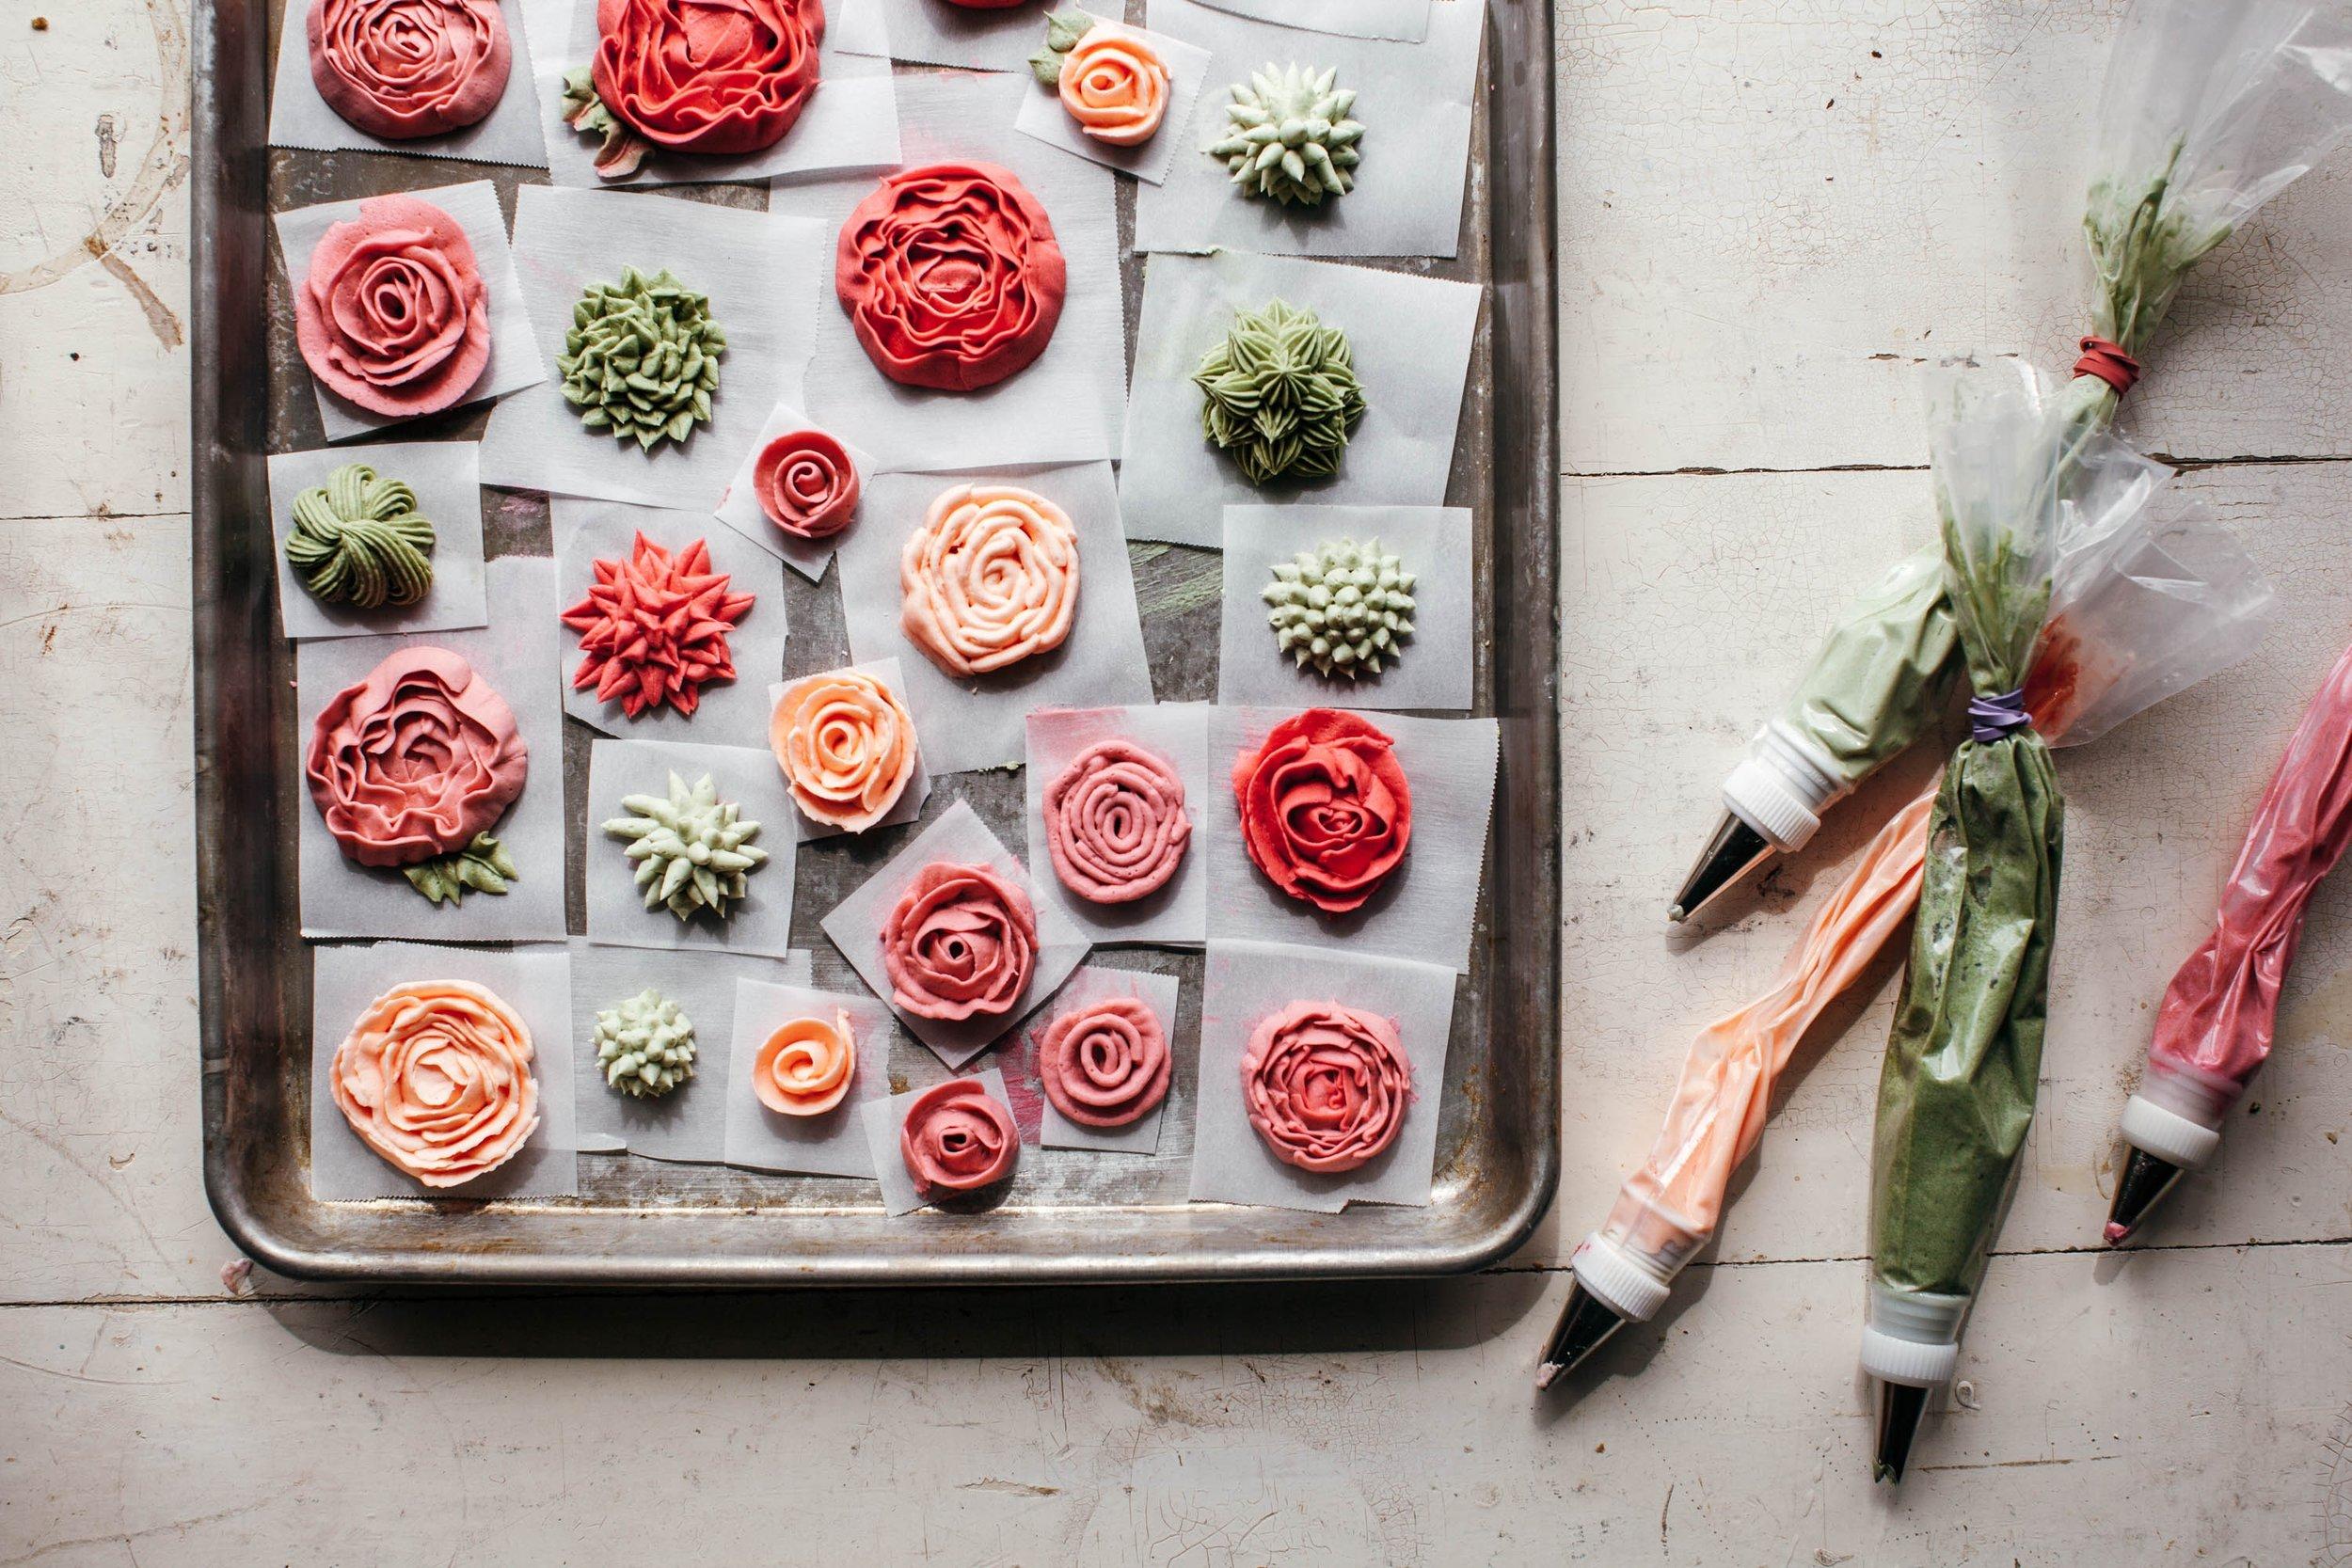 rose rose cake-3.jpg